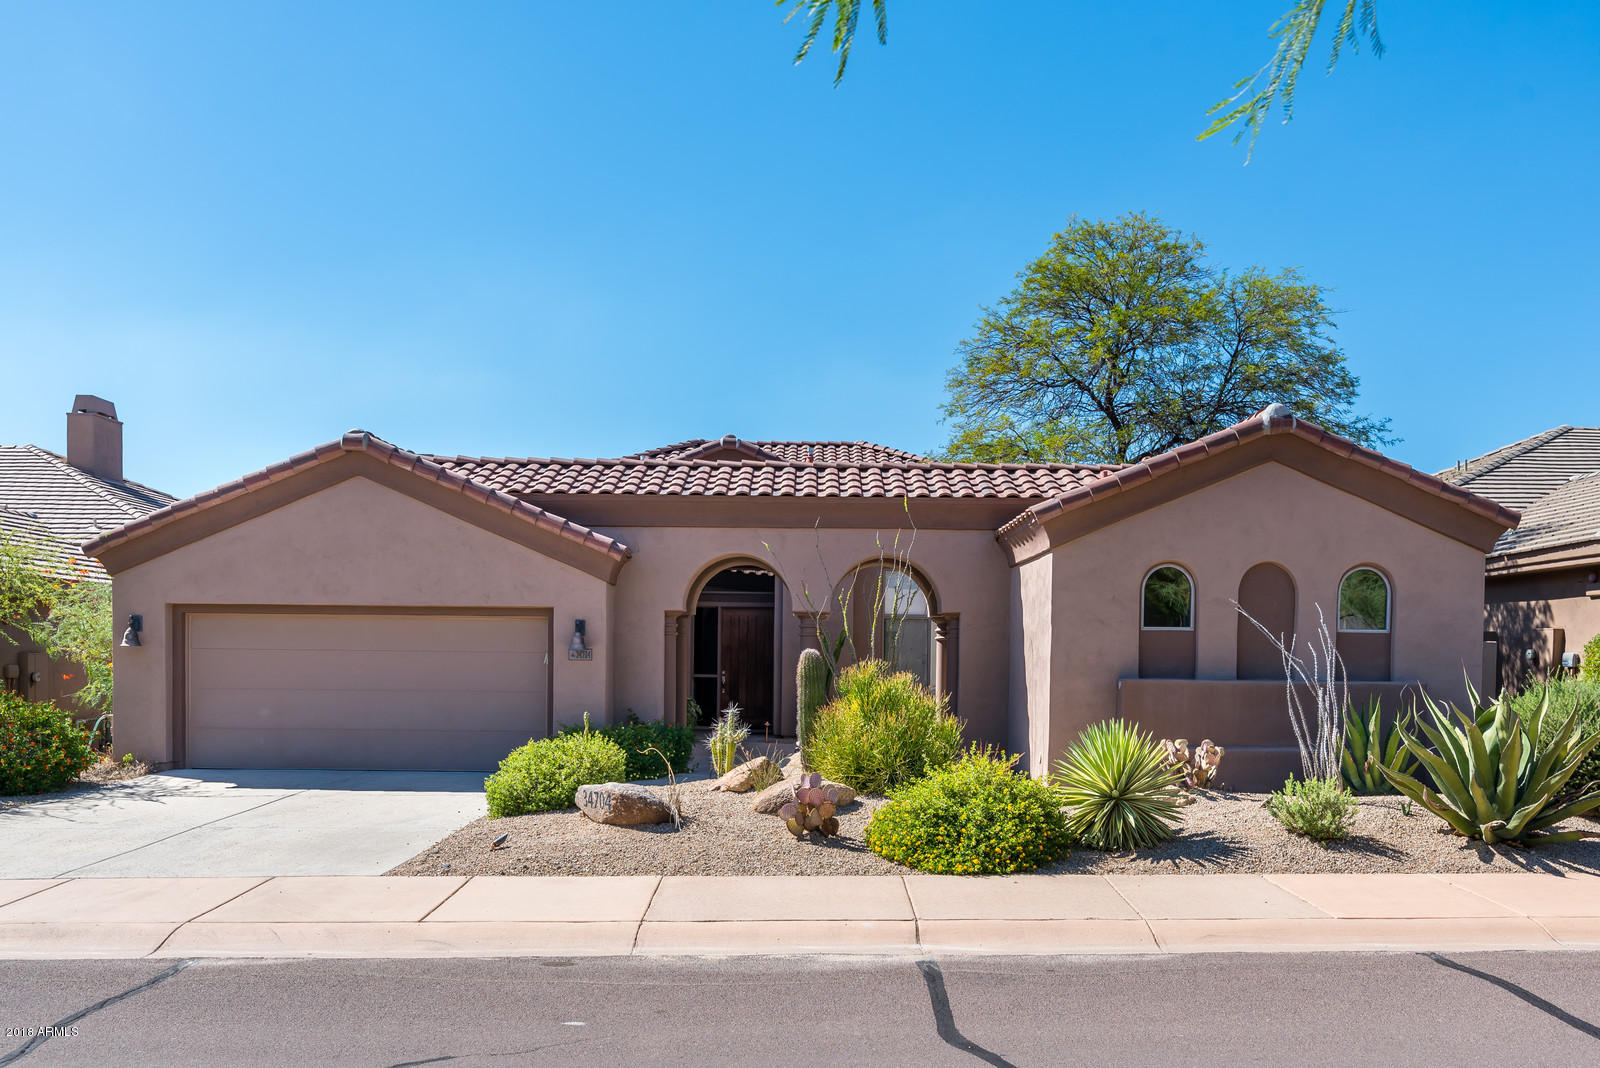 Photo of 34704 N 93rd Place, Scottsdale, AZ 85262